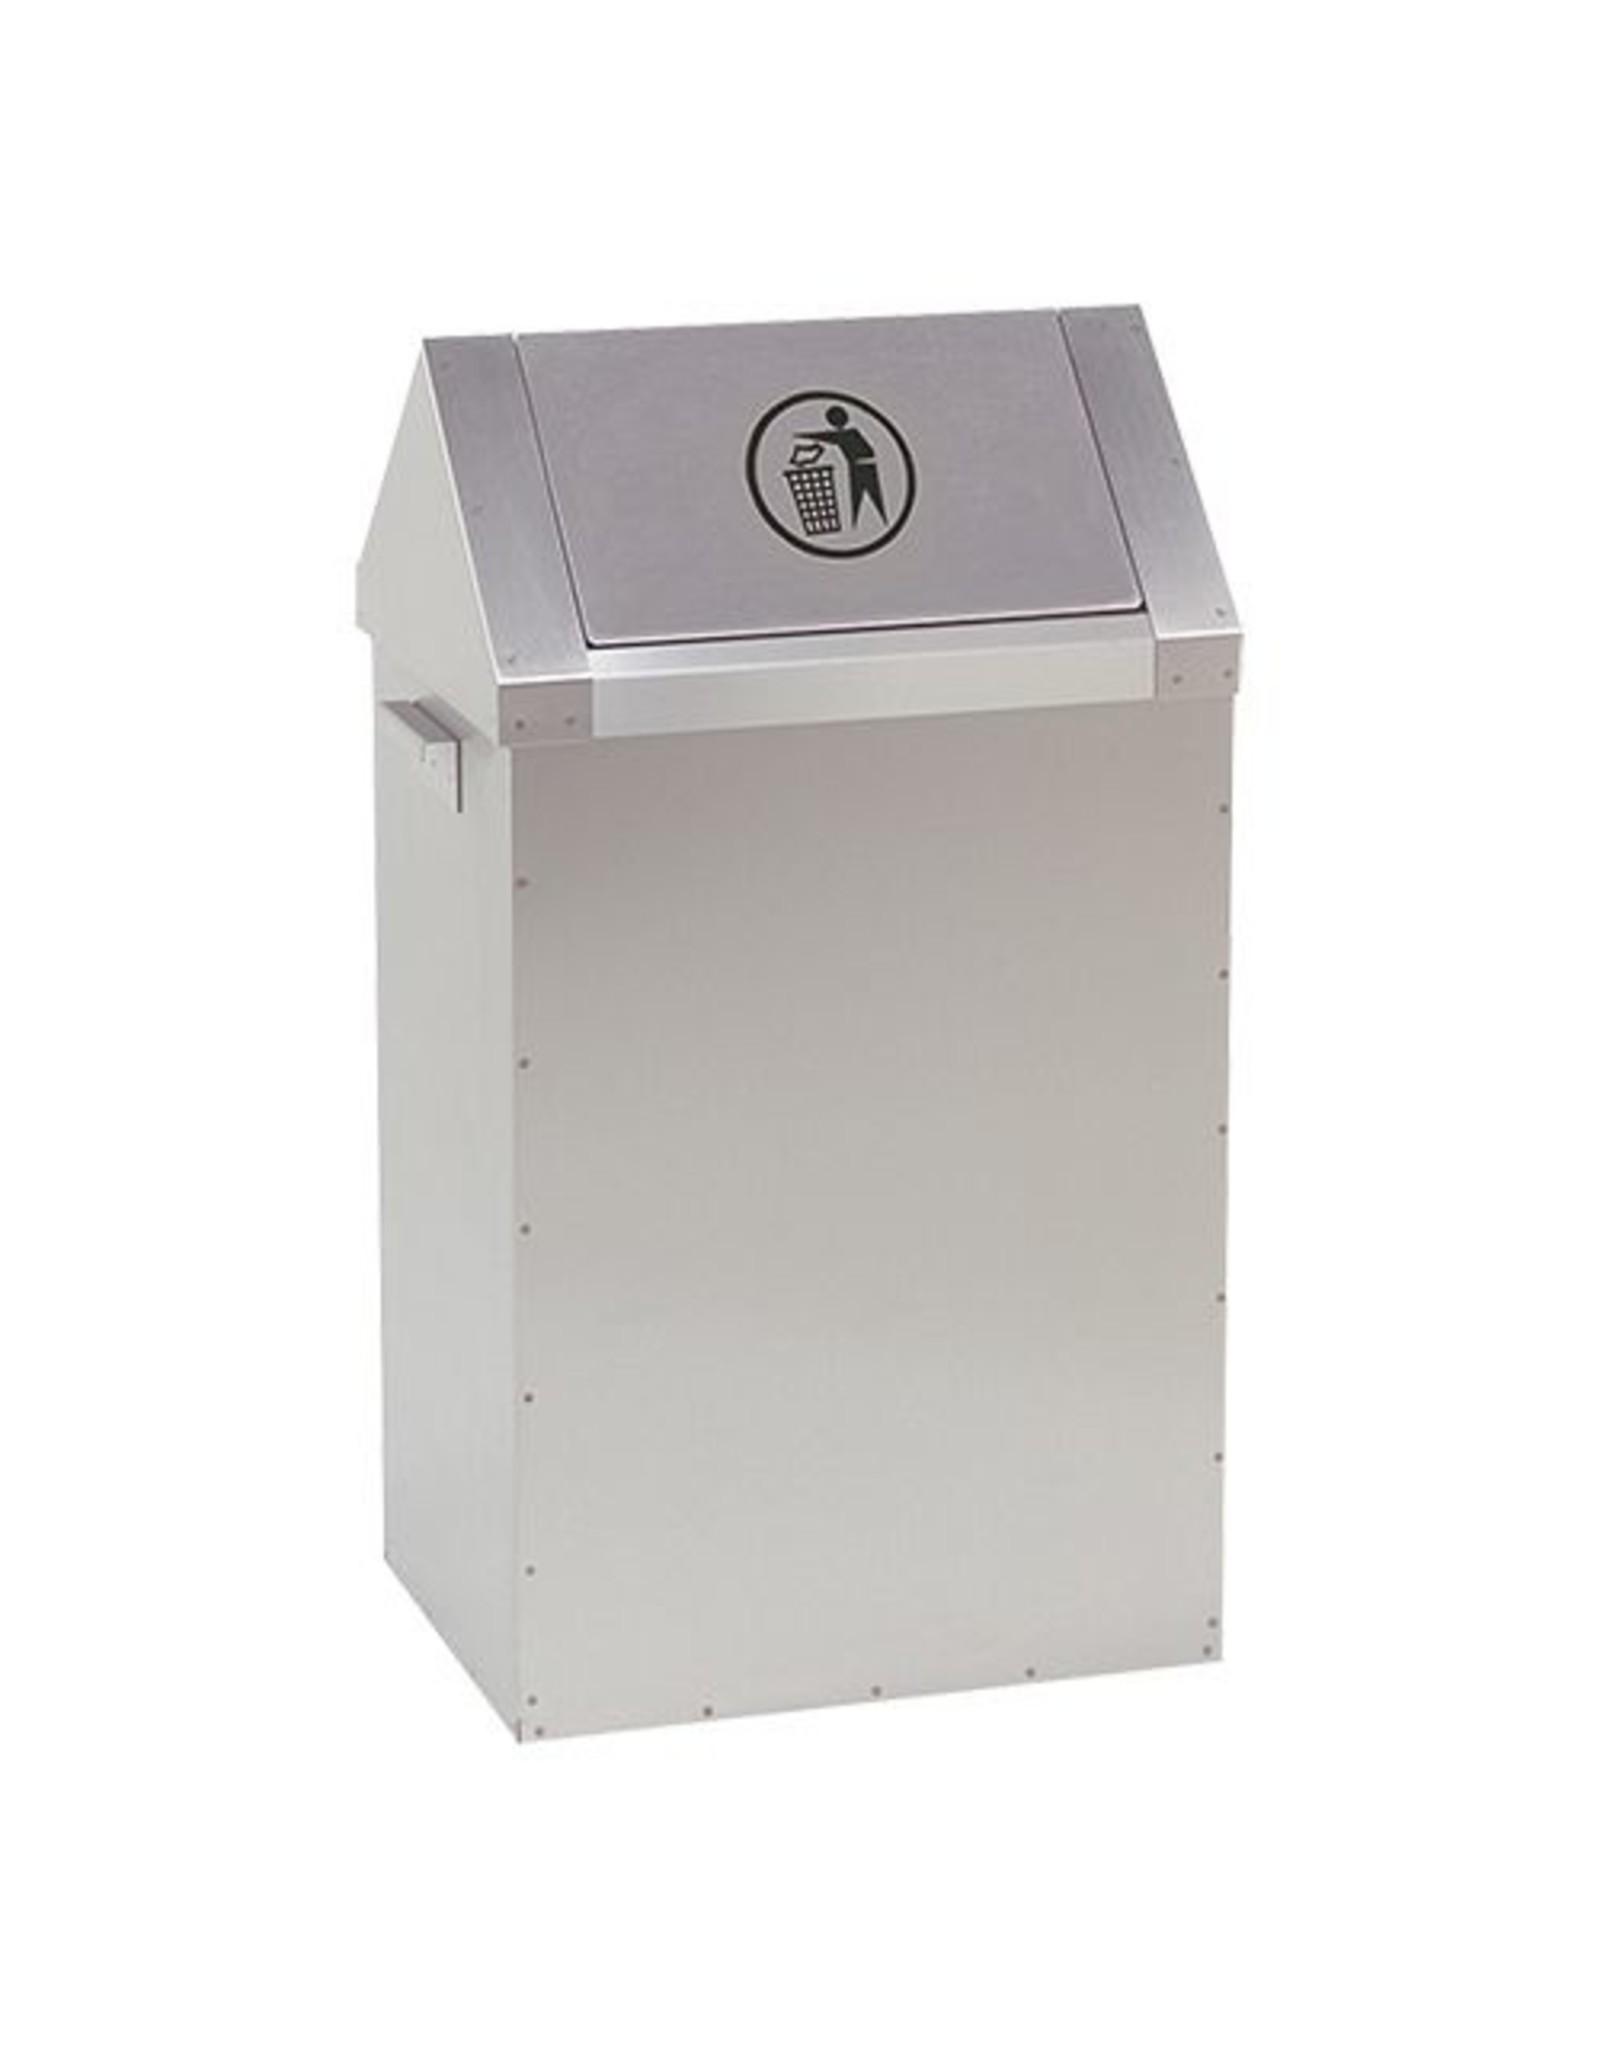 RVS afvalbak met tuimeldeksel | 65L | (H)73x(B)40x(D)30cm